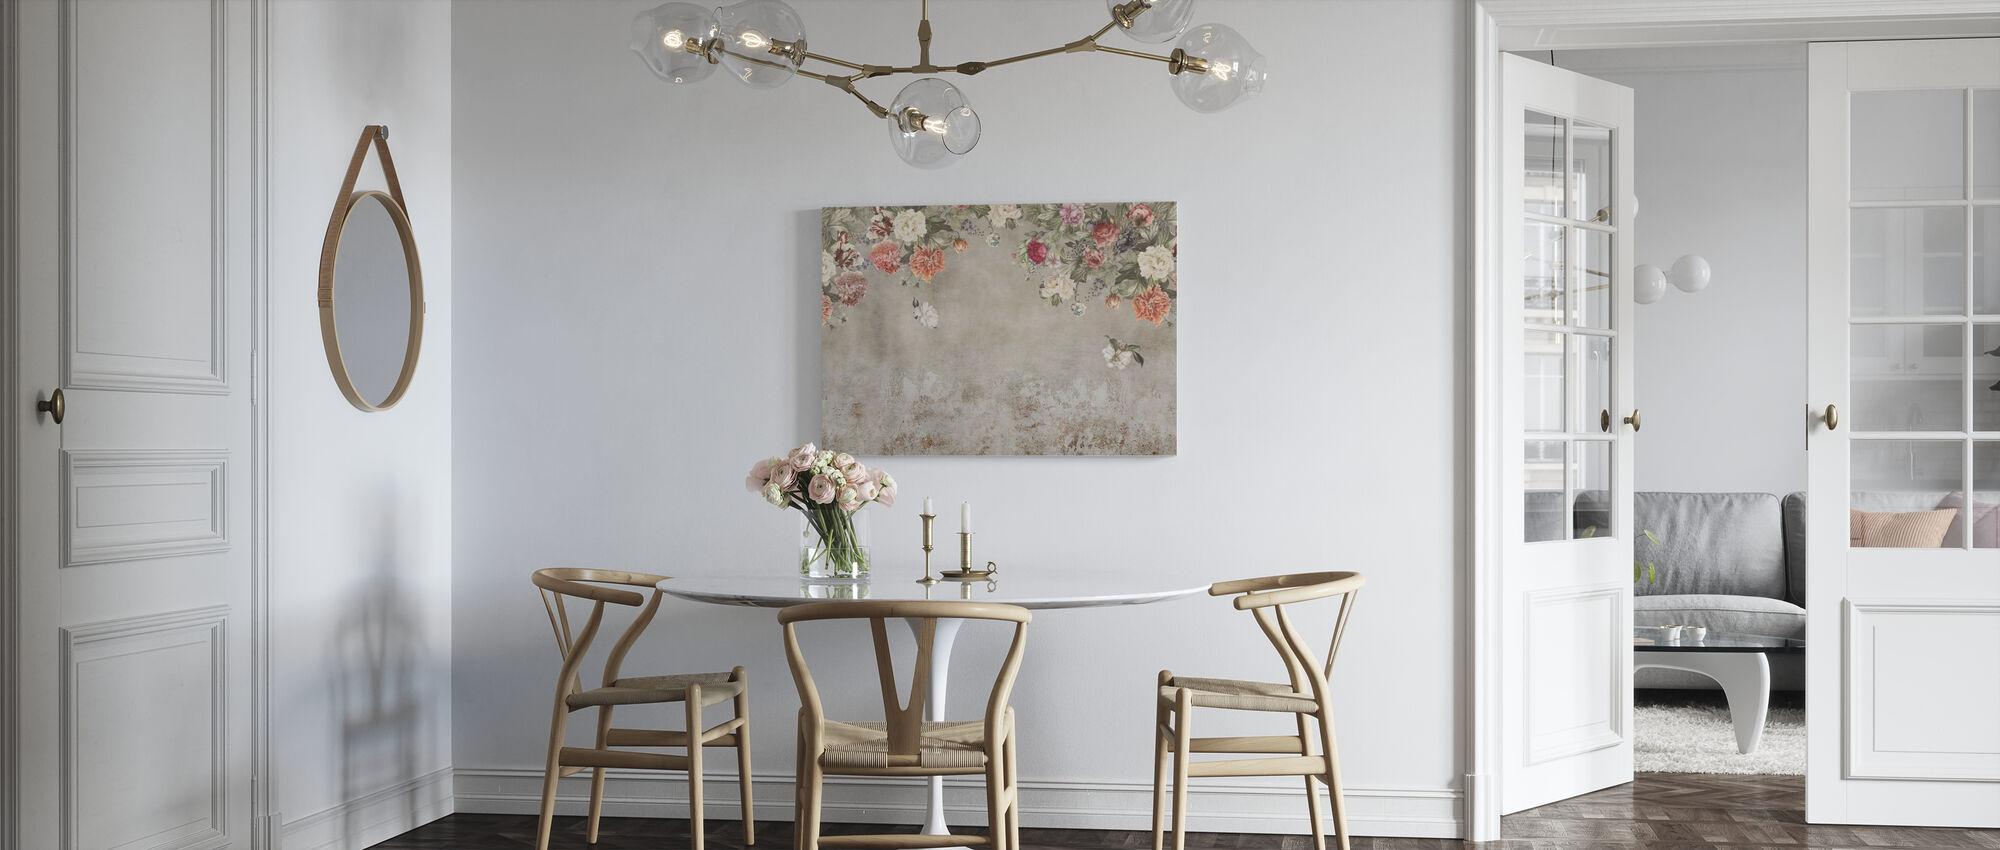 Vintage Bloem Muur - Canvas print - Keuken